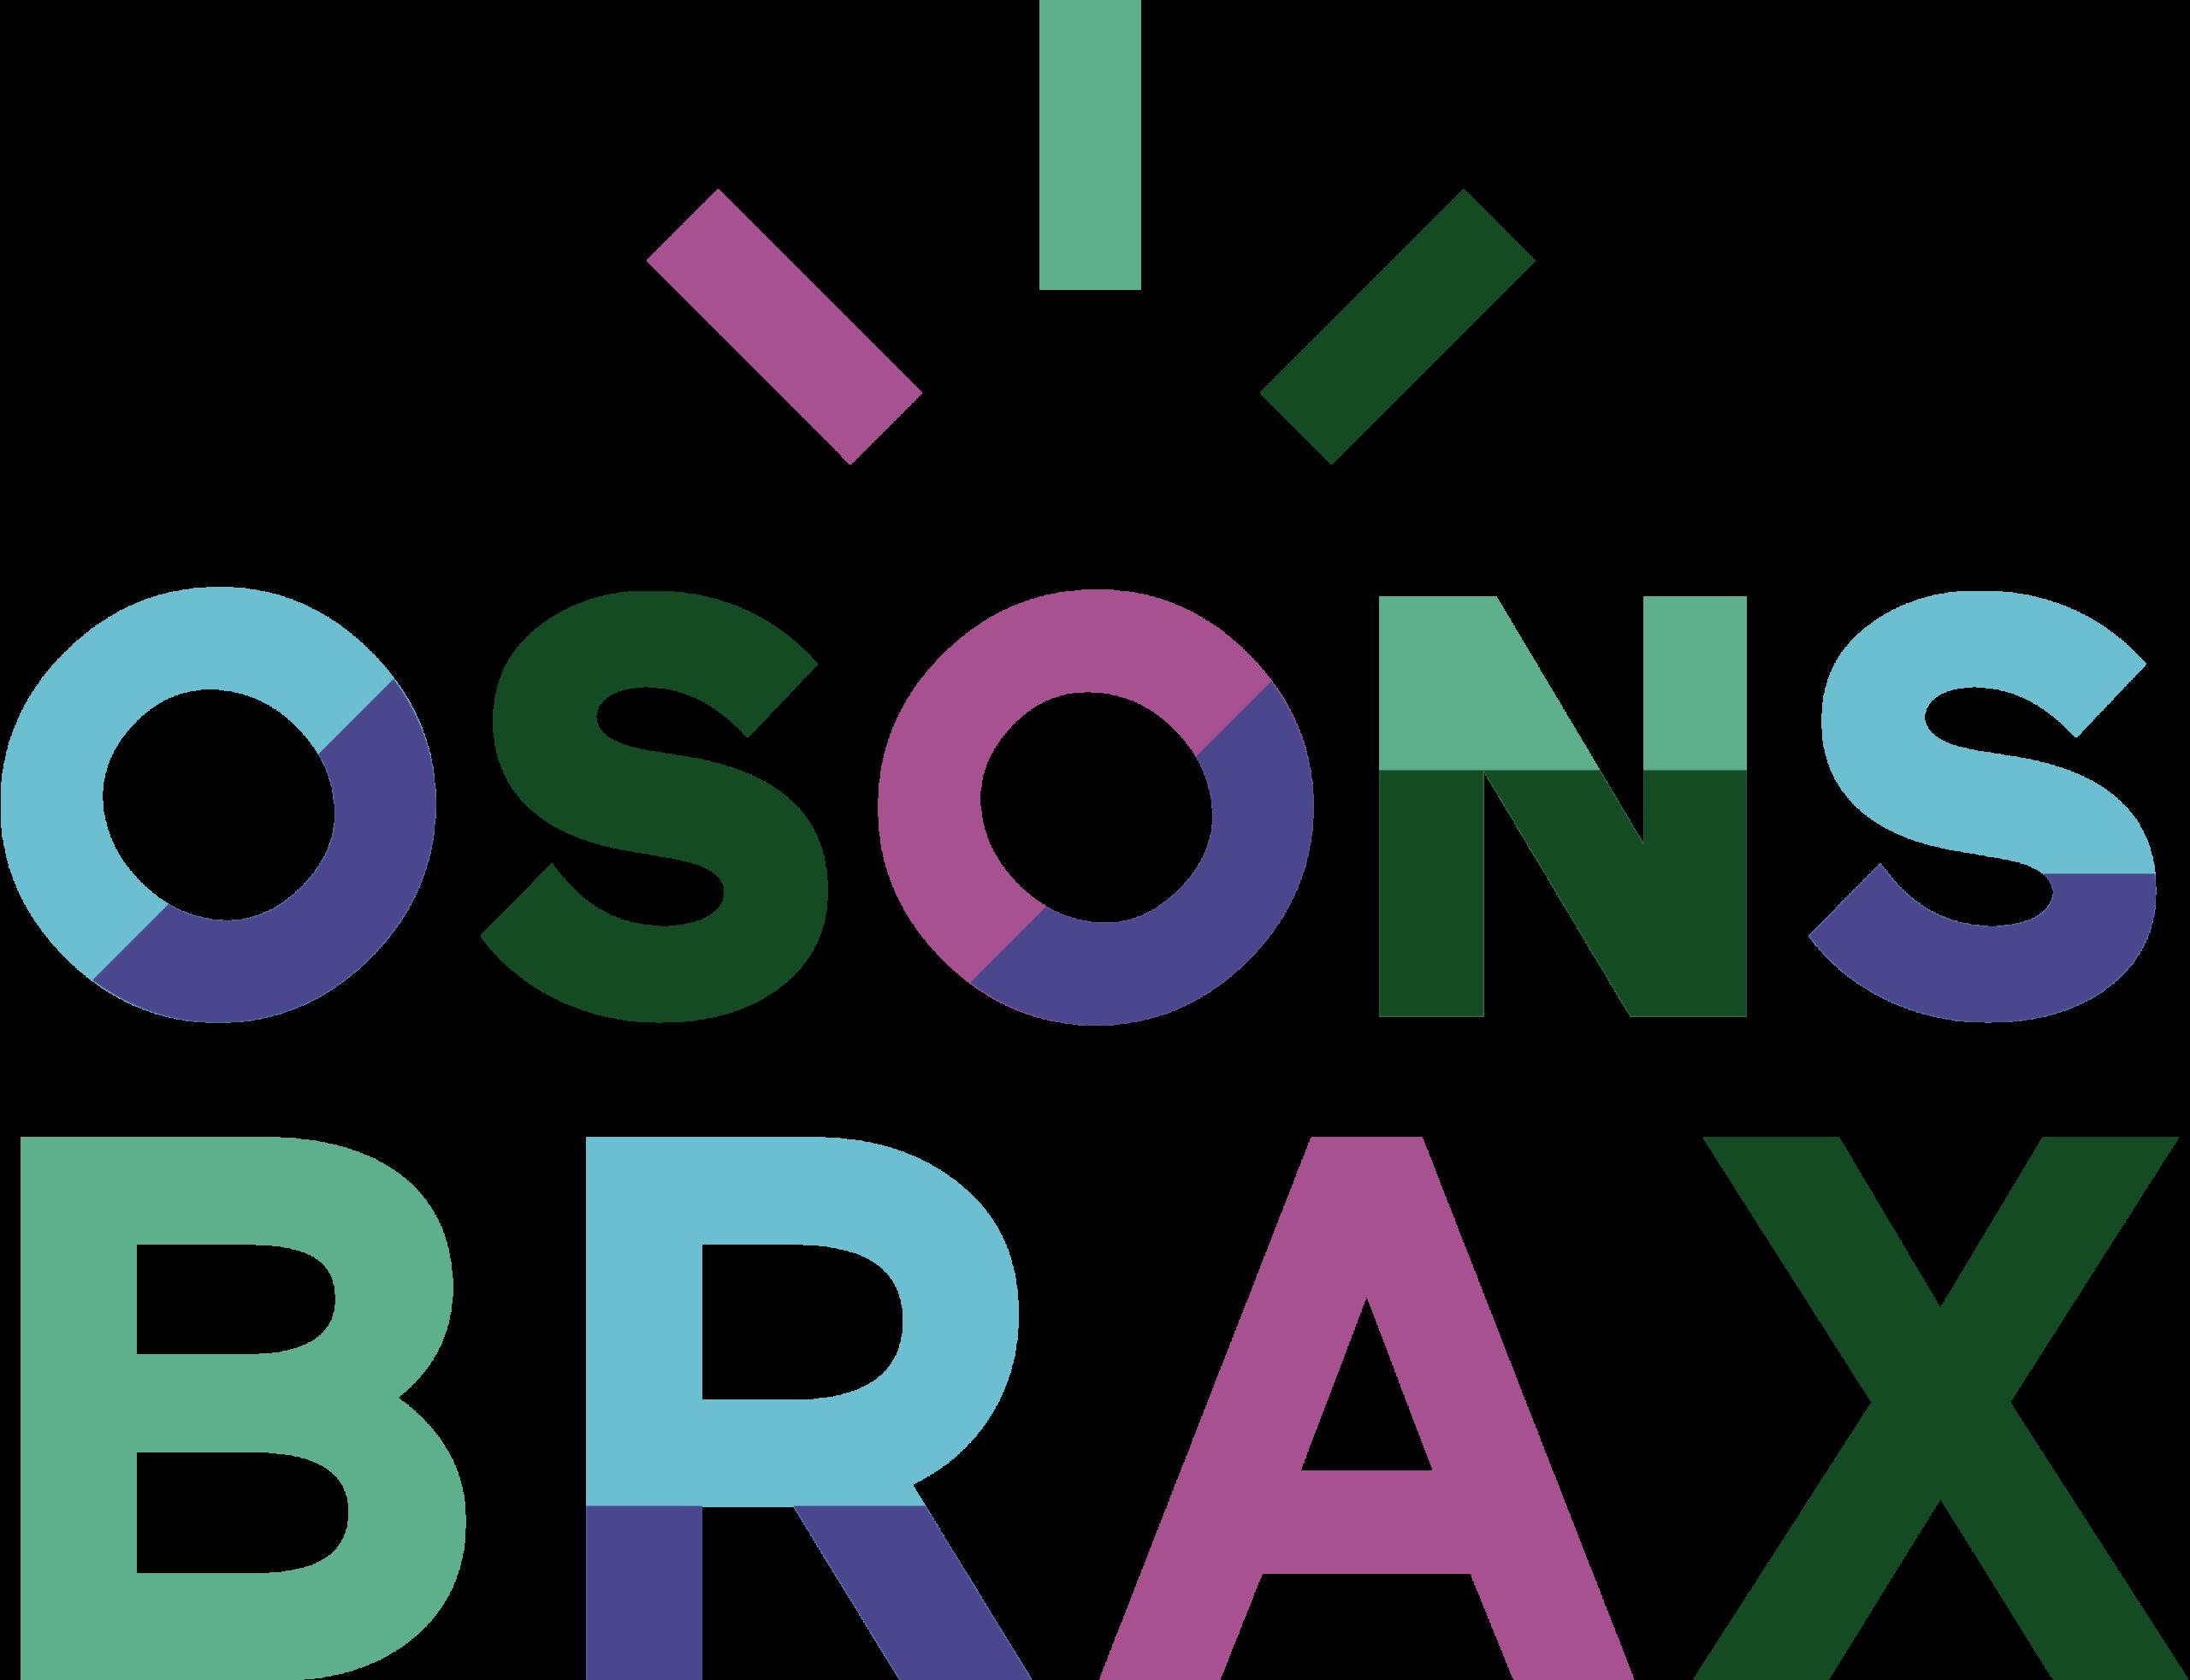 Osons Brax